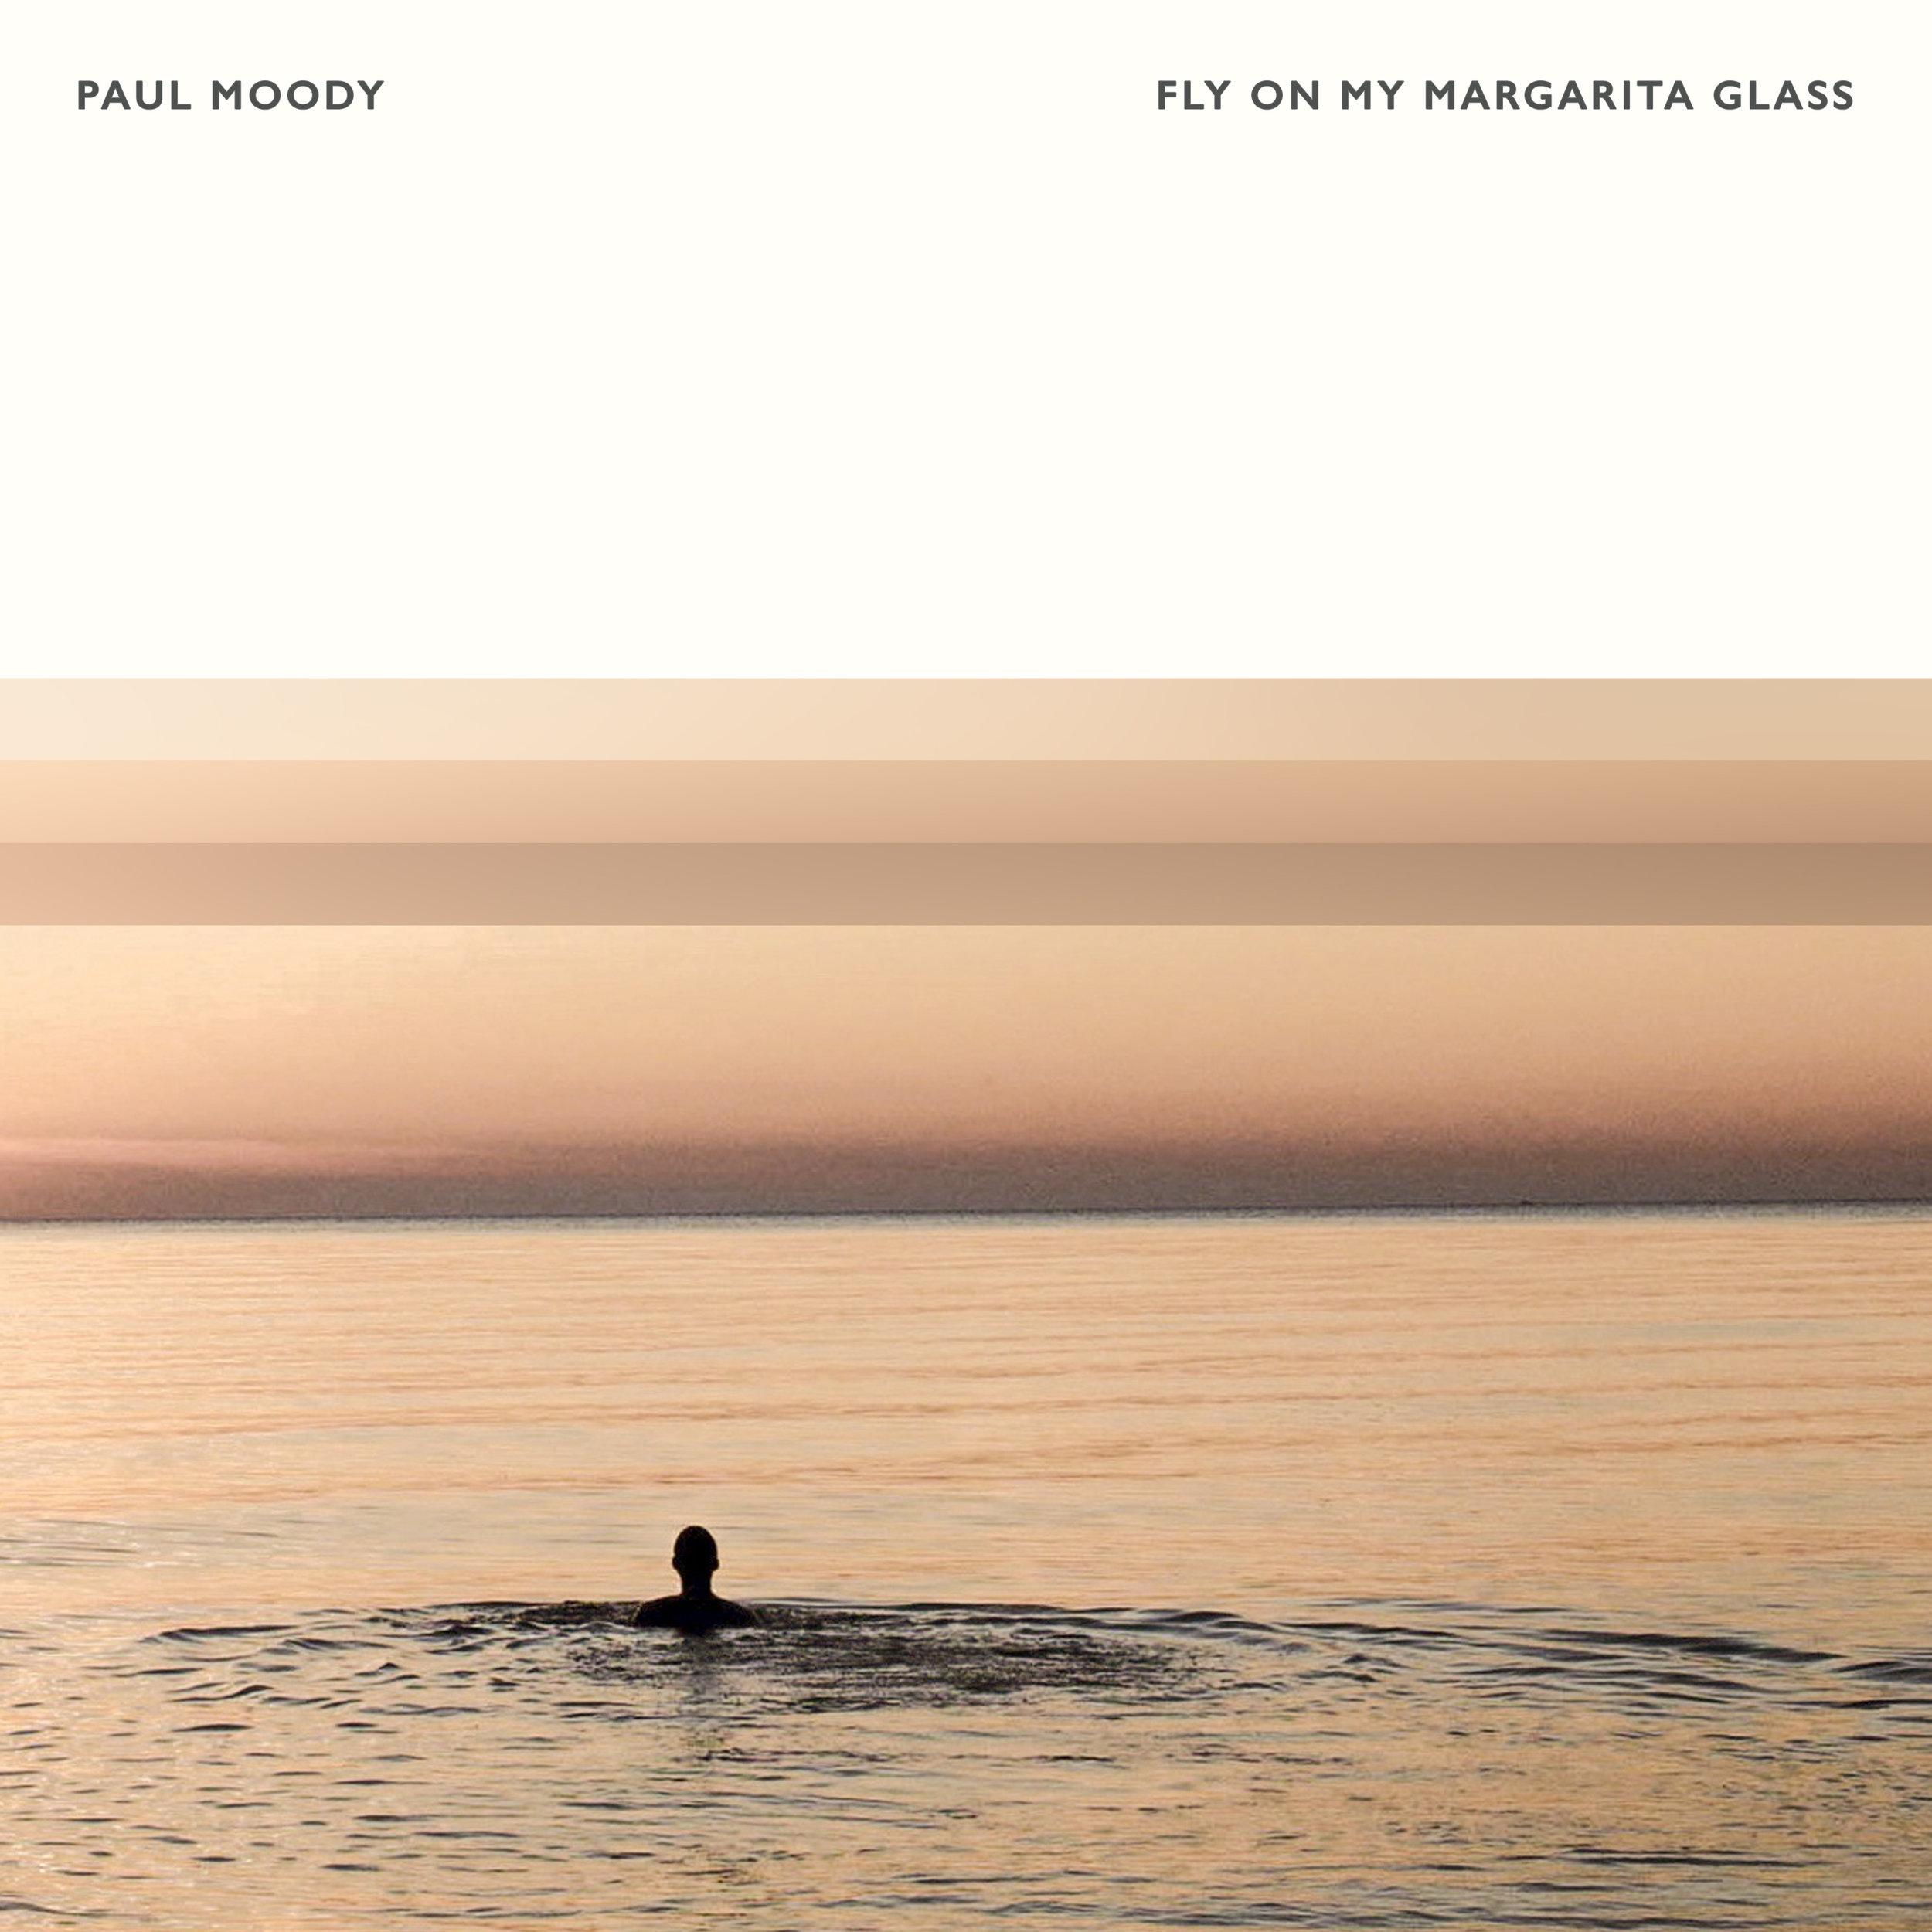 Paul Moody - Fly On My Margarita Glass